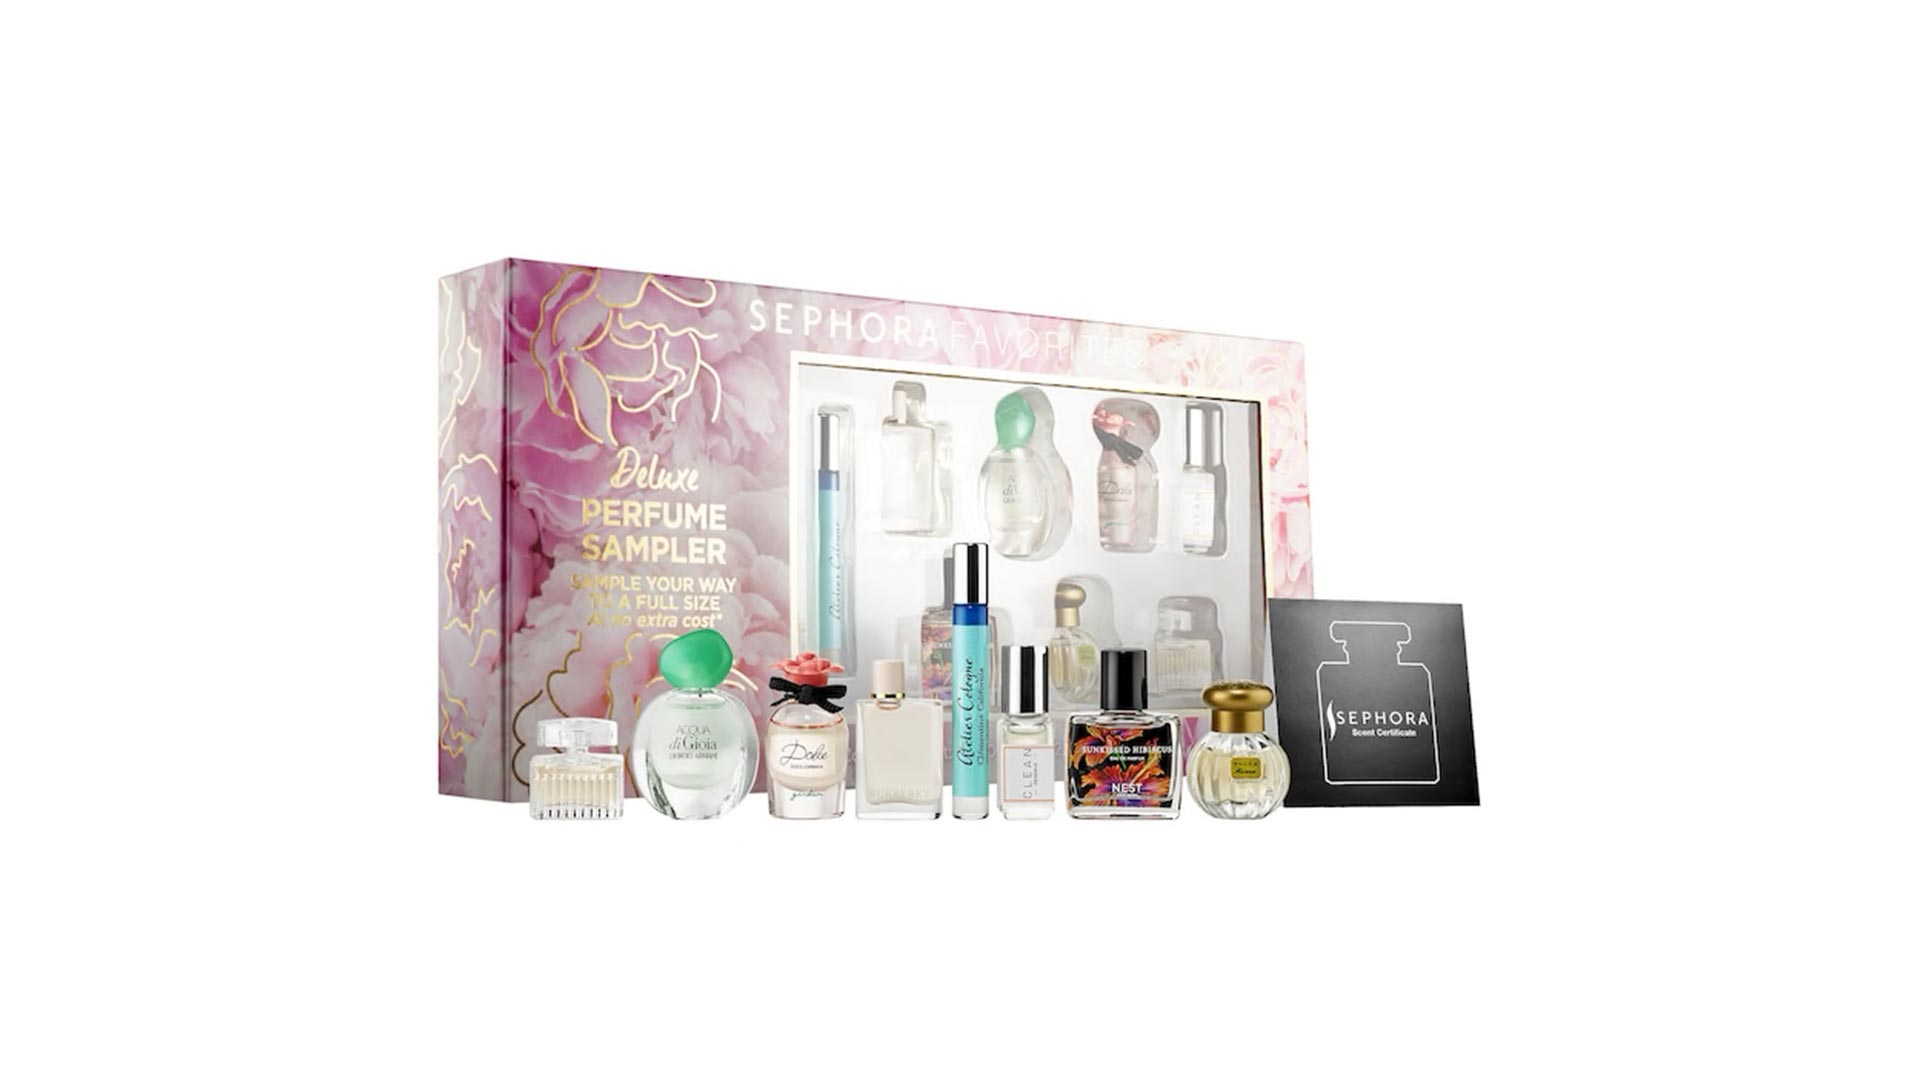 Sephora Perfume Set